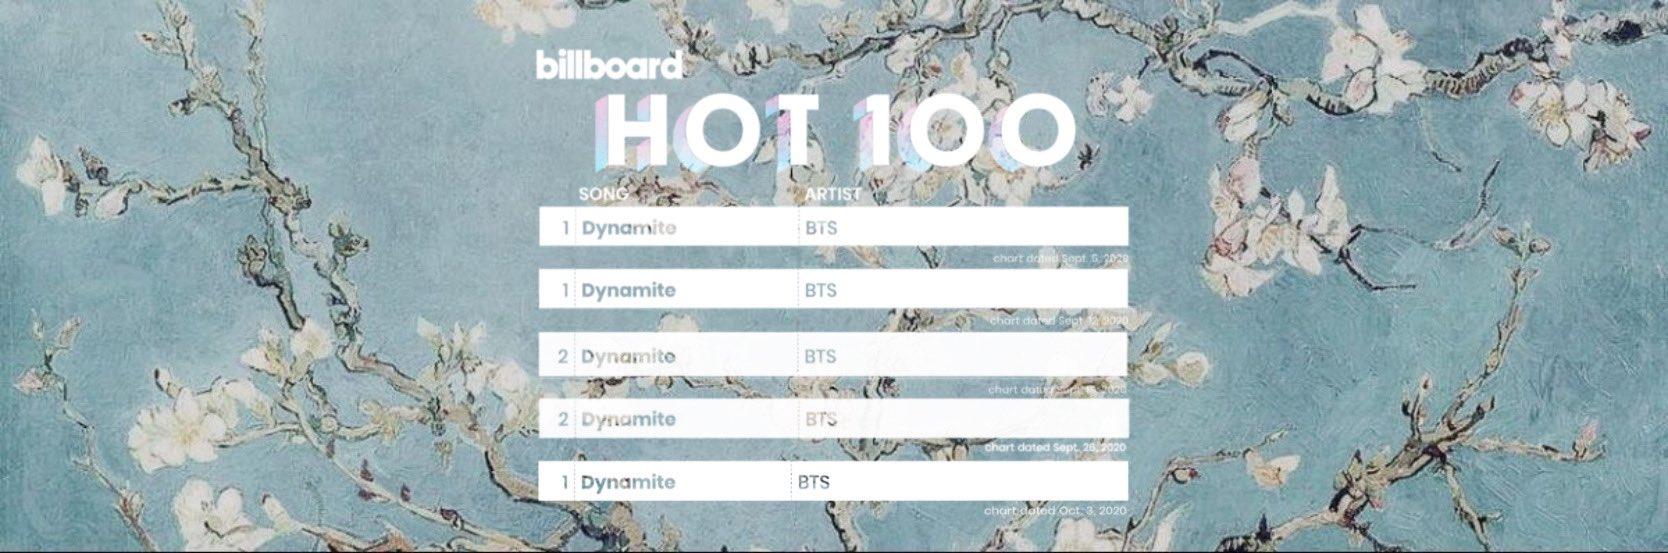 Á´®á´±bts Layouts On Twitter Bts Bts Dynamite 1 On Billboard Hot 100 Headers Congratulations Bts Twt Rt If Using Saving Give Bangtan Iayouts Credits 3